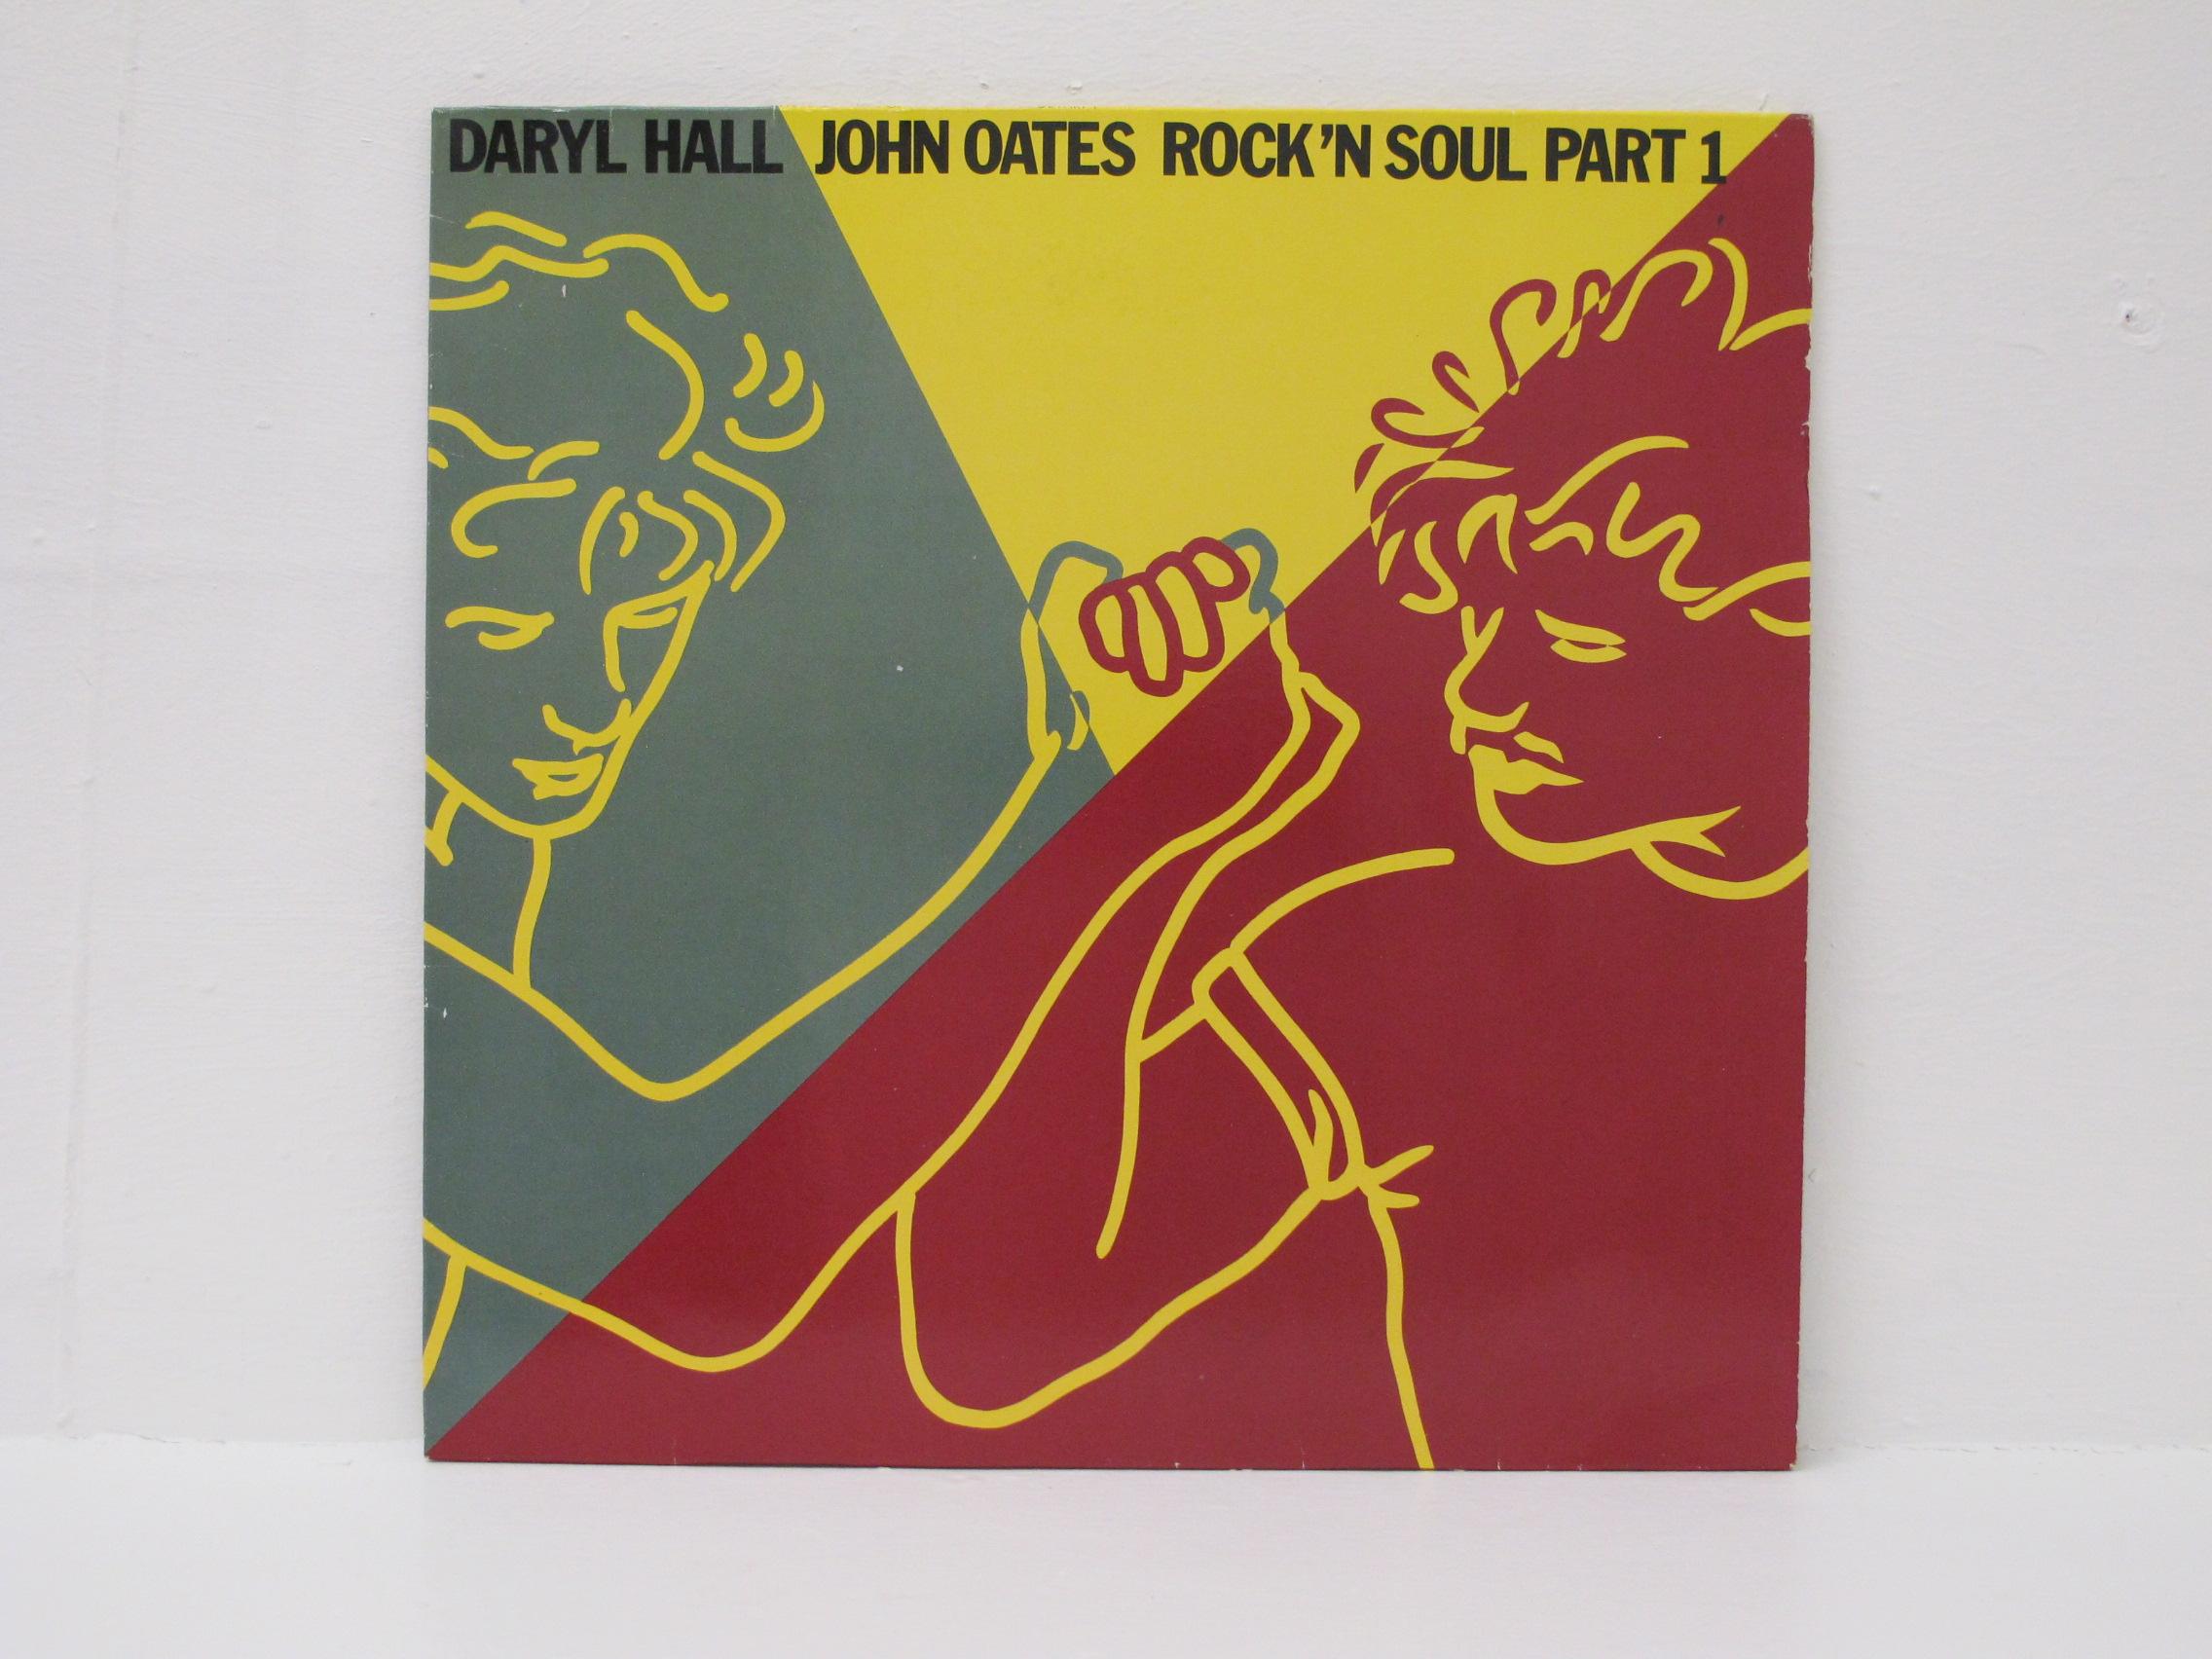 Daryl Hall & John Oates - Rock'N Soul Part 1